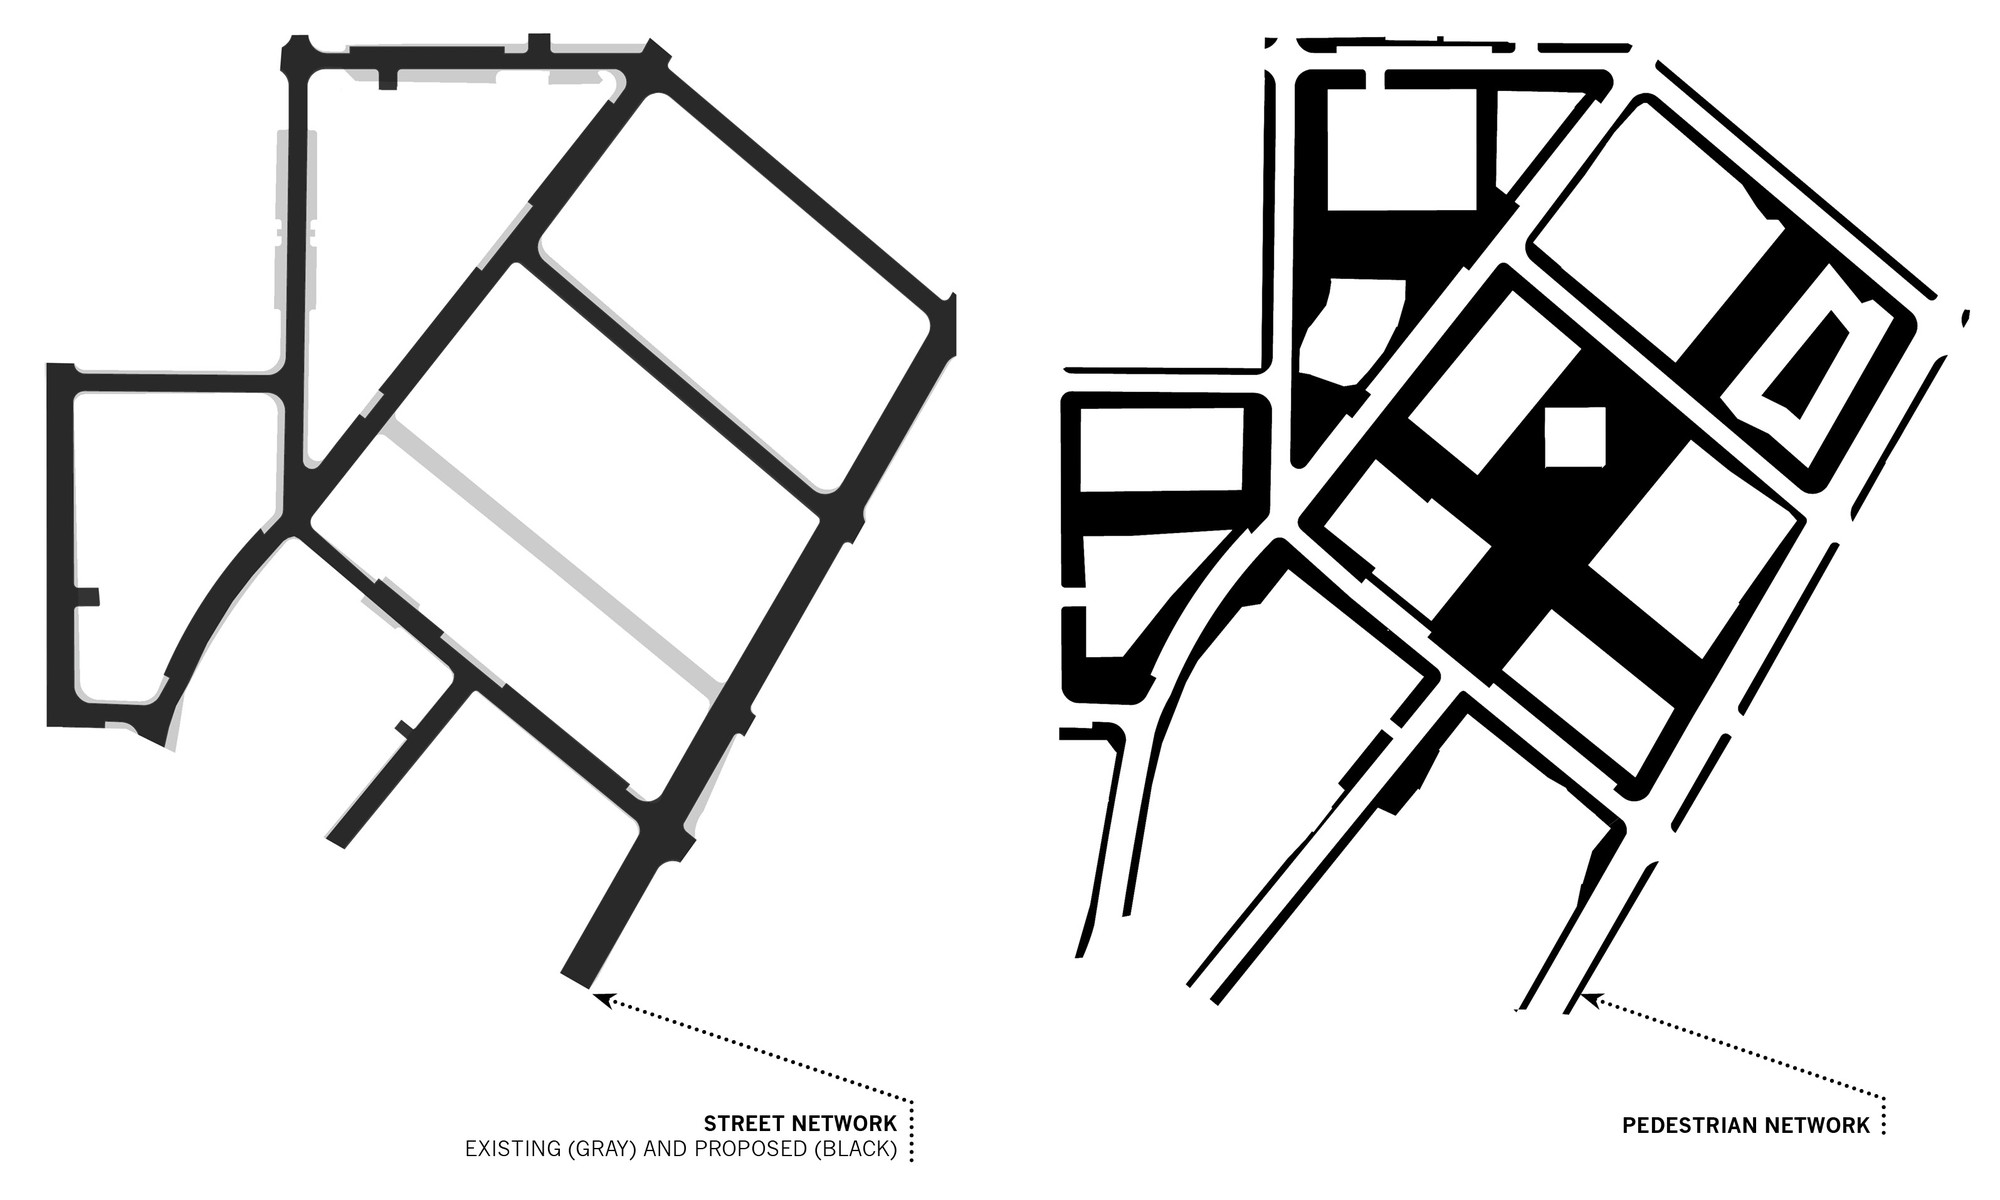 u0026 39 new acadia  retrofitting urban decay u0026 39  winning proposal